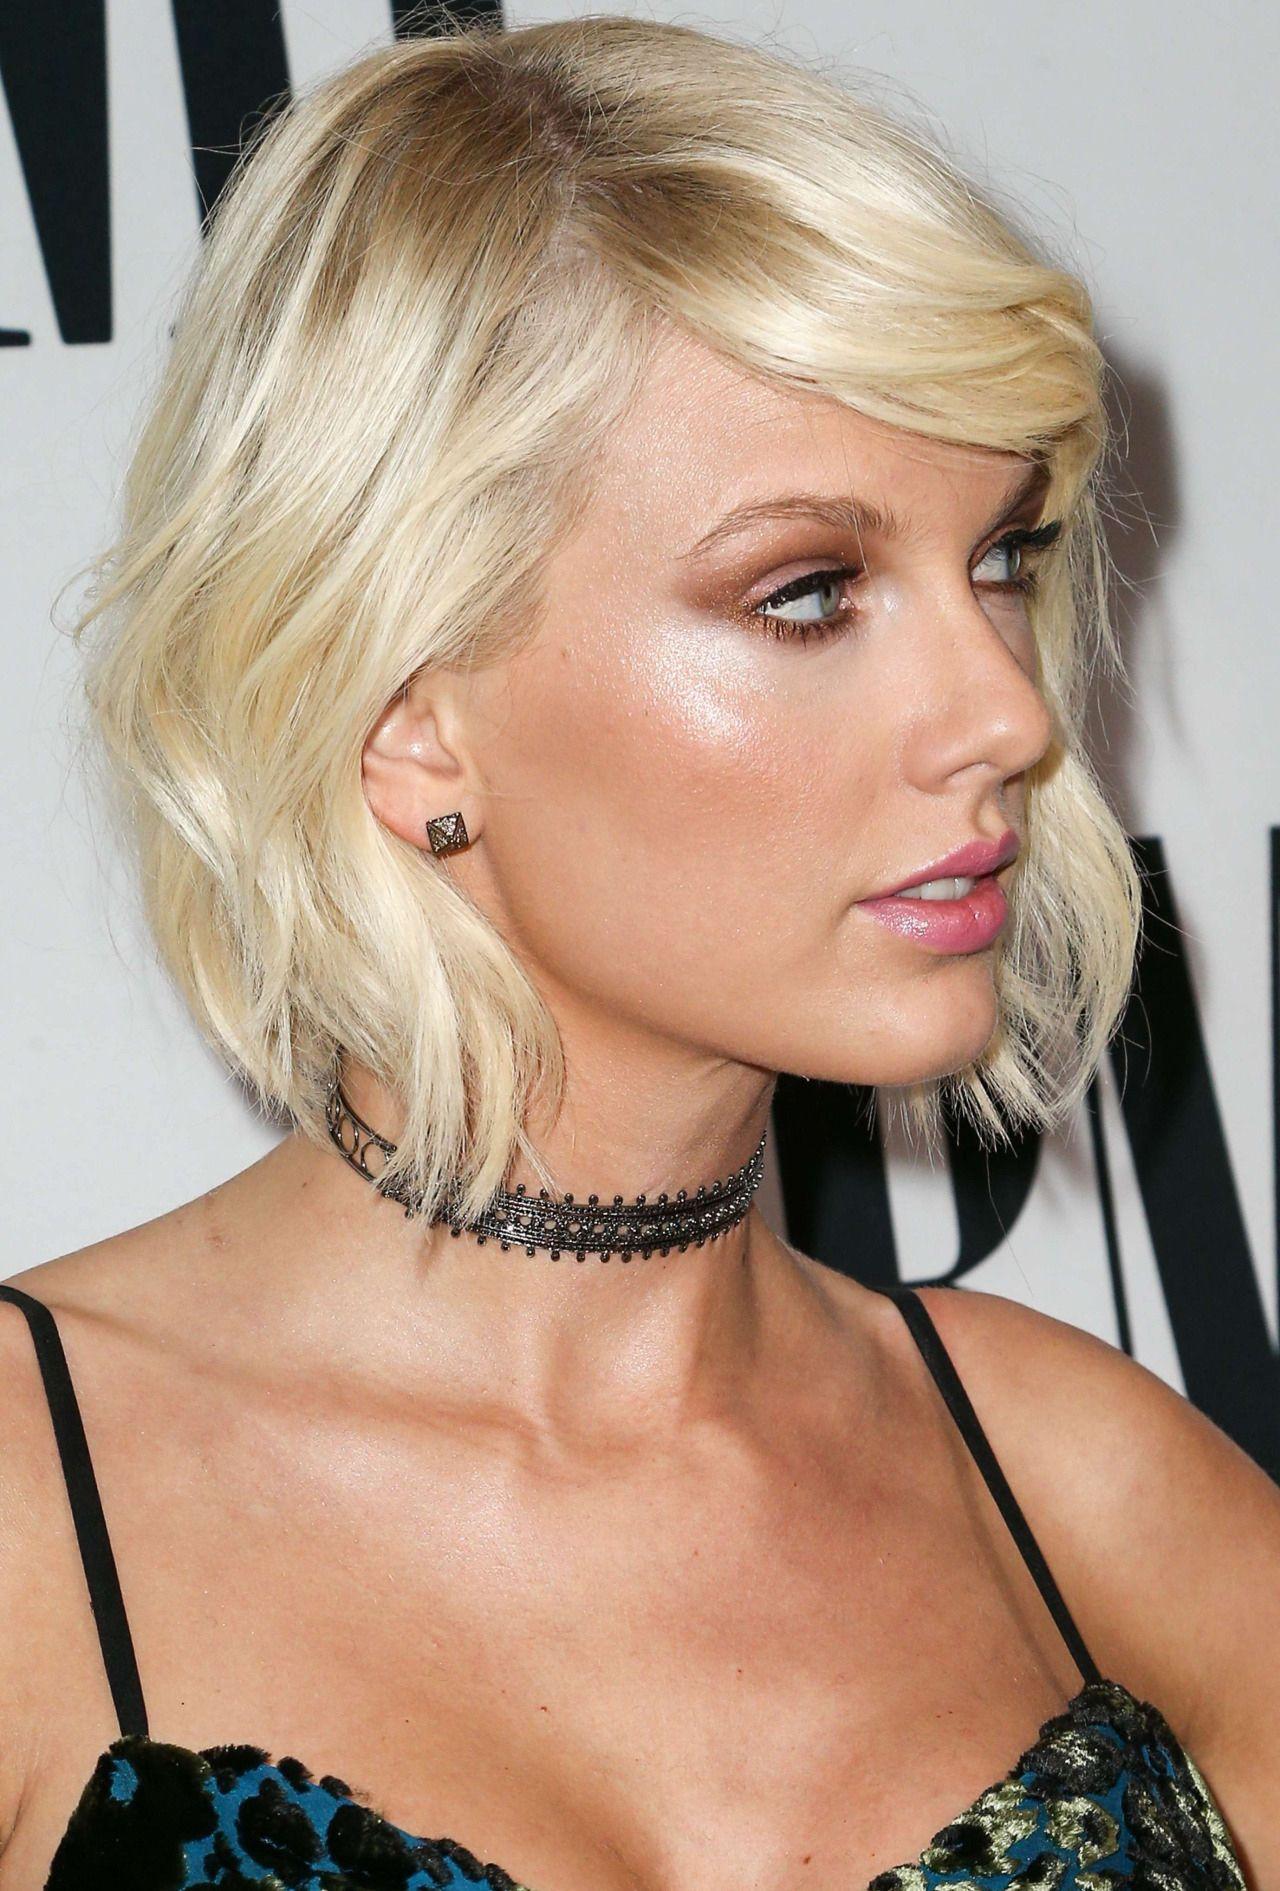 Bleachella Why Taylor Swift Really Went Blonde At Coachella Taylor Swift Hair Karlie Kloss Taylor Swift Taylor Swift Bleached Hair